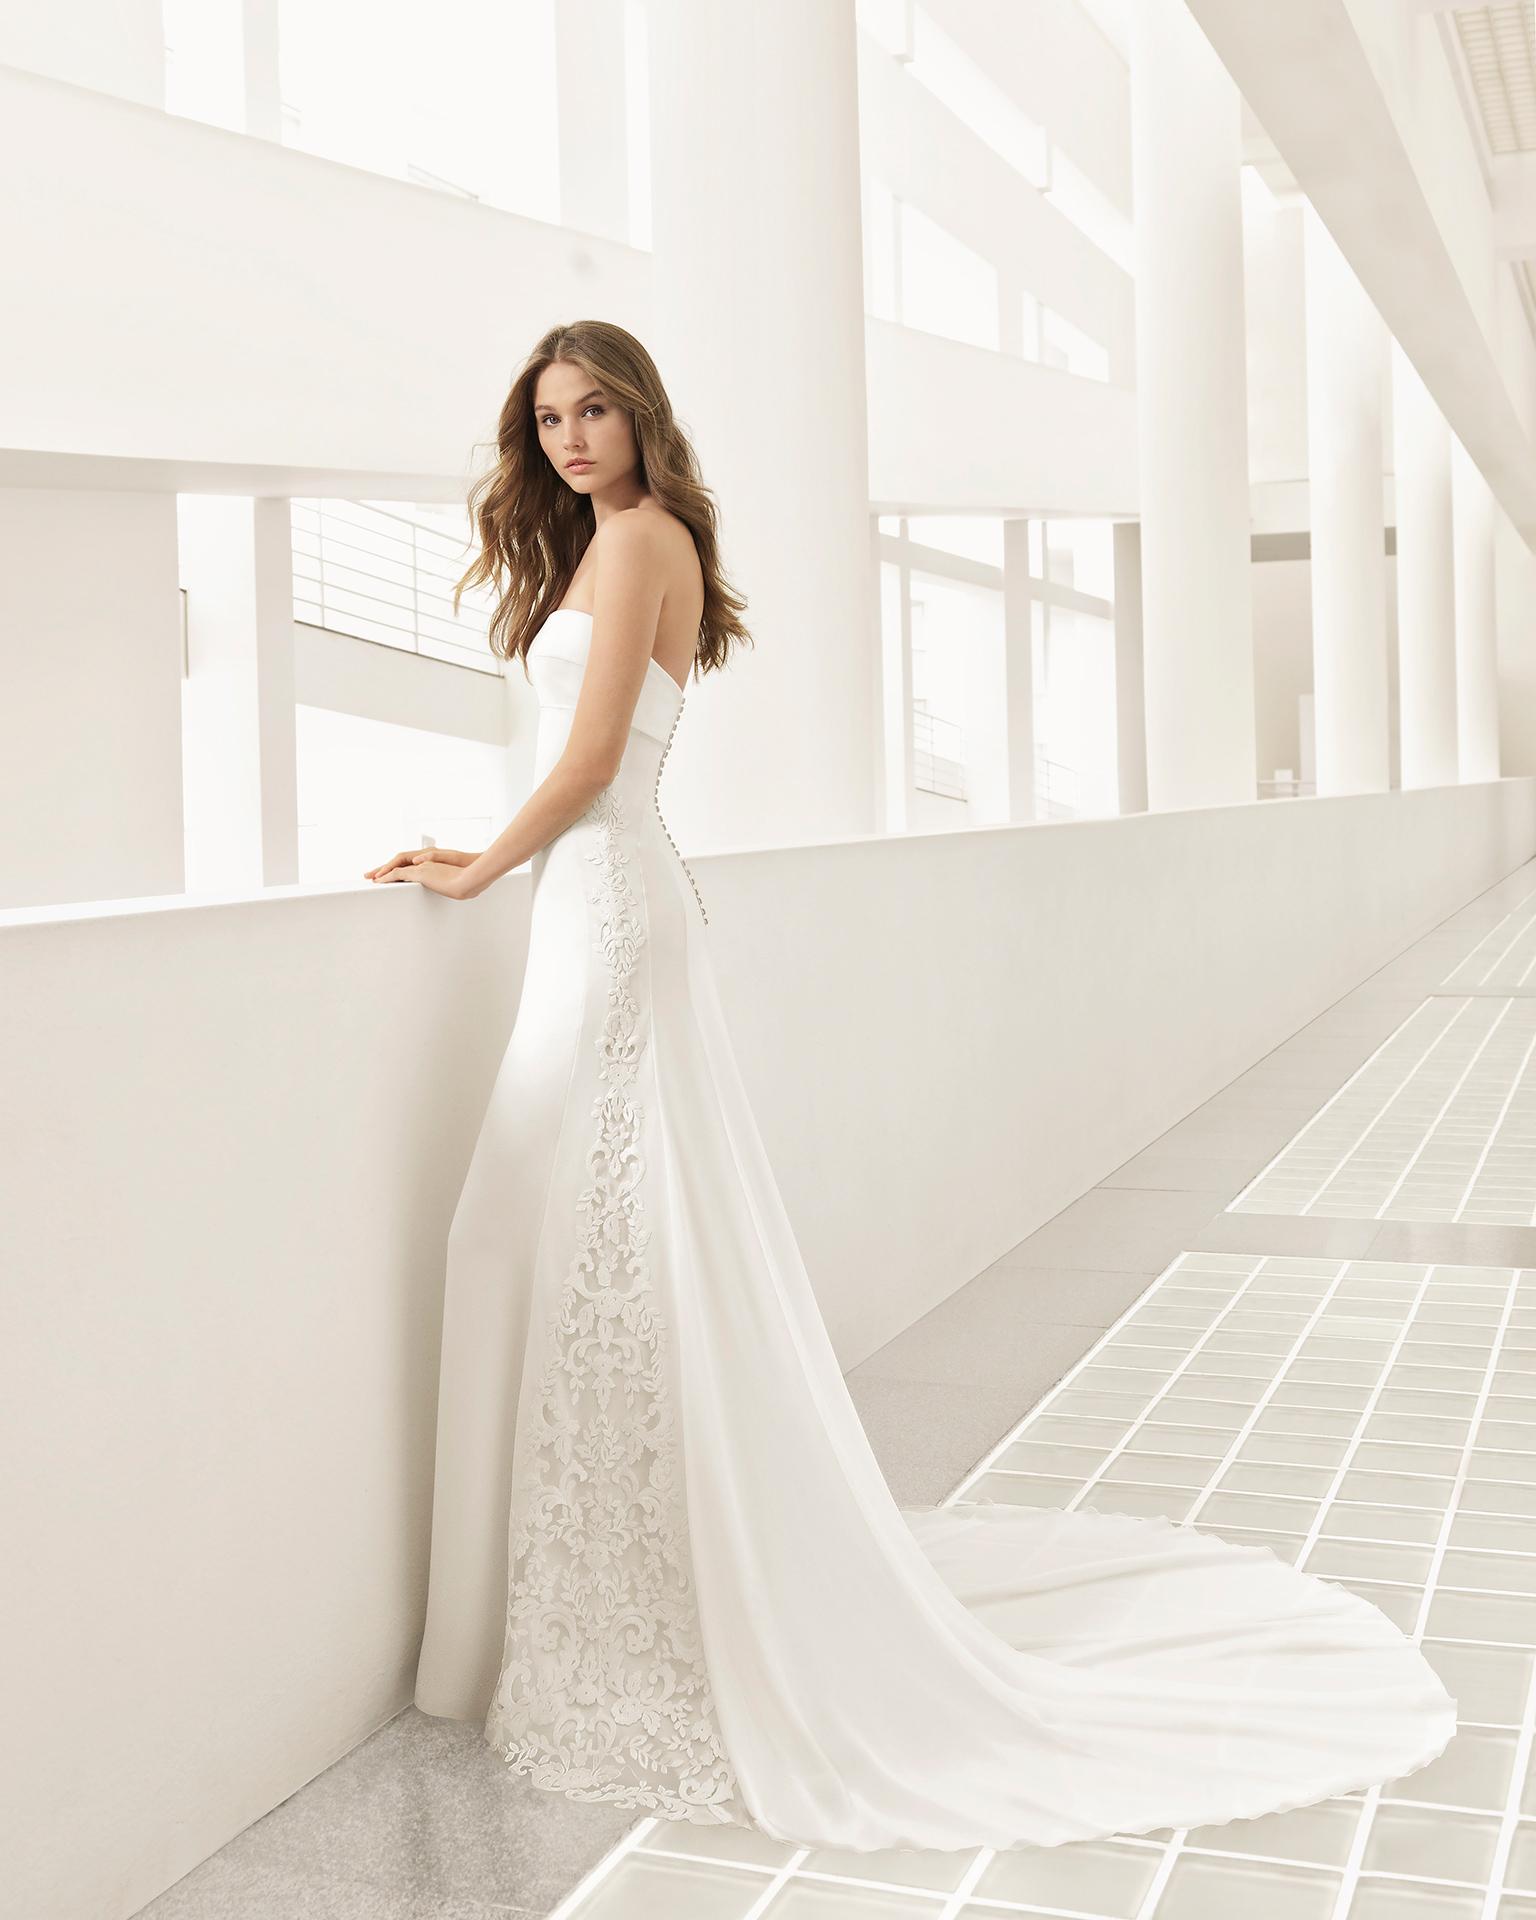 Poder Hochzeit 2018 Kollektion Rosa Clará Couture